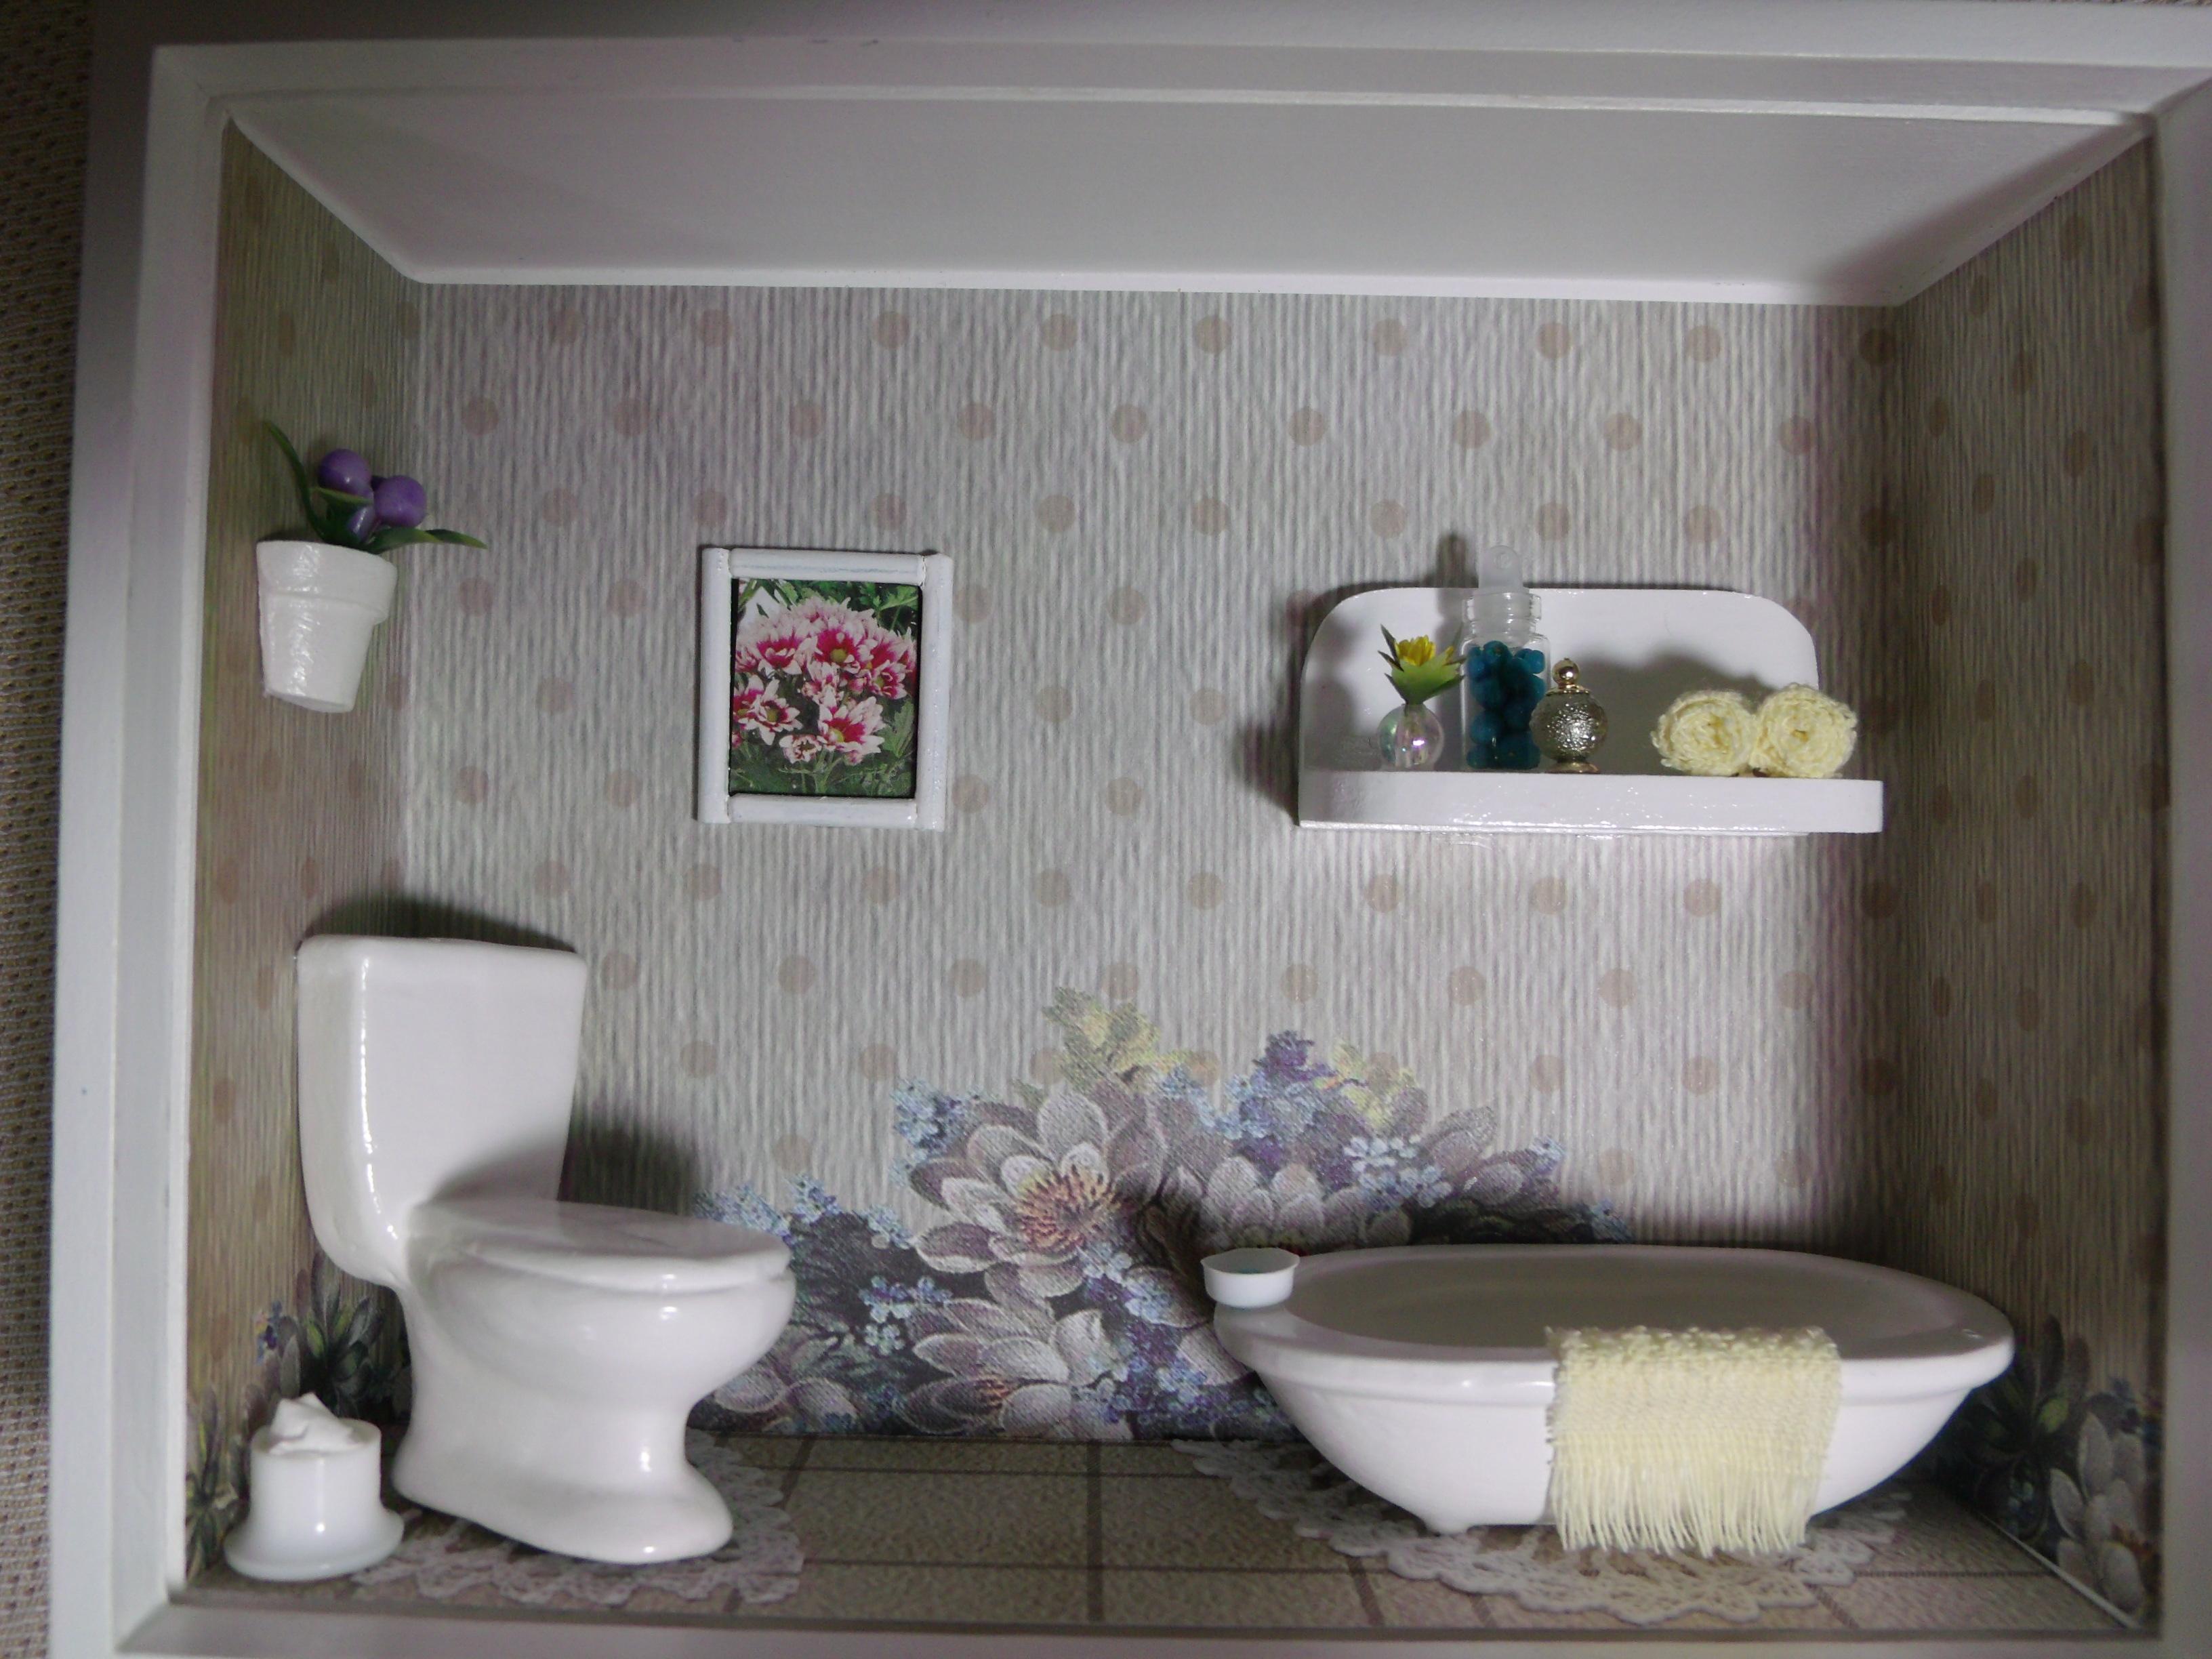 Nicho de Banheiro N 22  Elo7 -> Nicho Banheiro Mdf